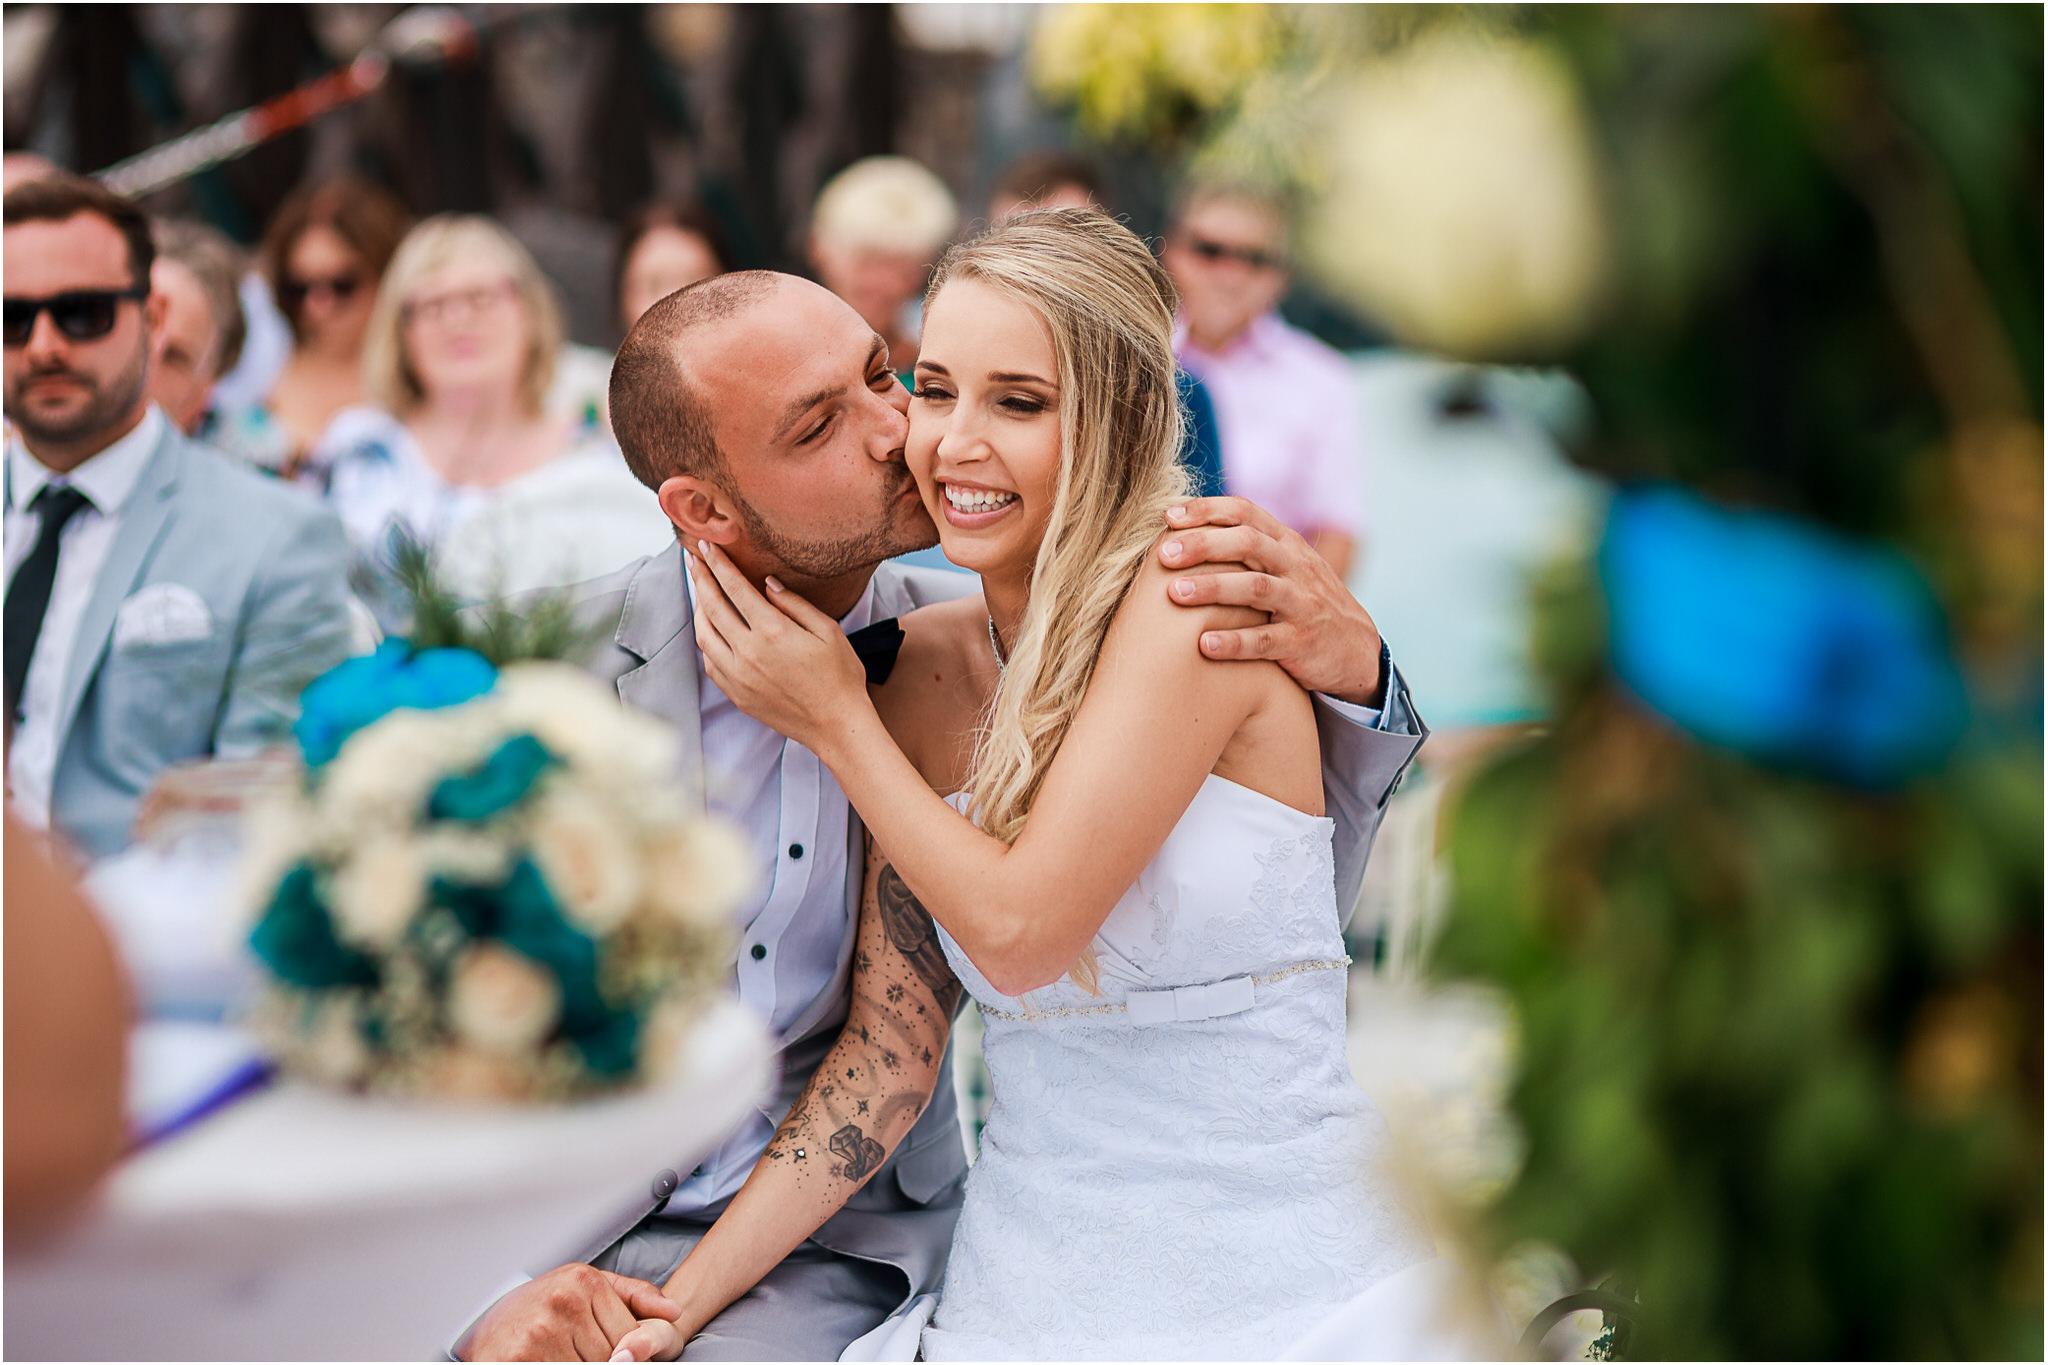 Hochzeitsfoto-Teneriffa-28.jpg